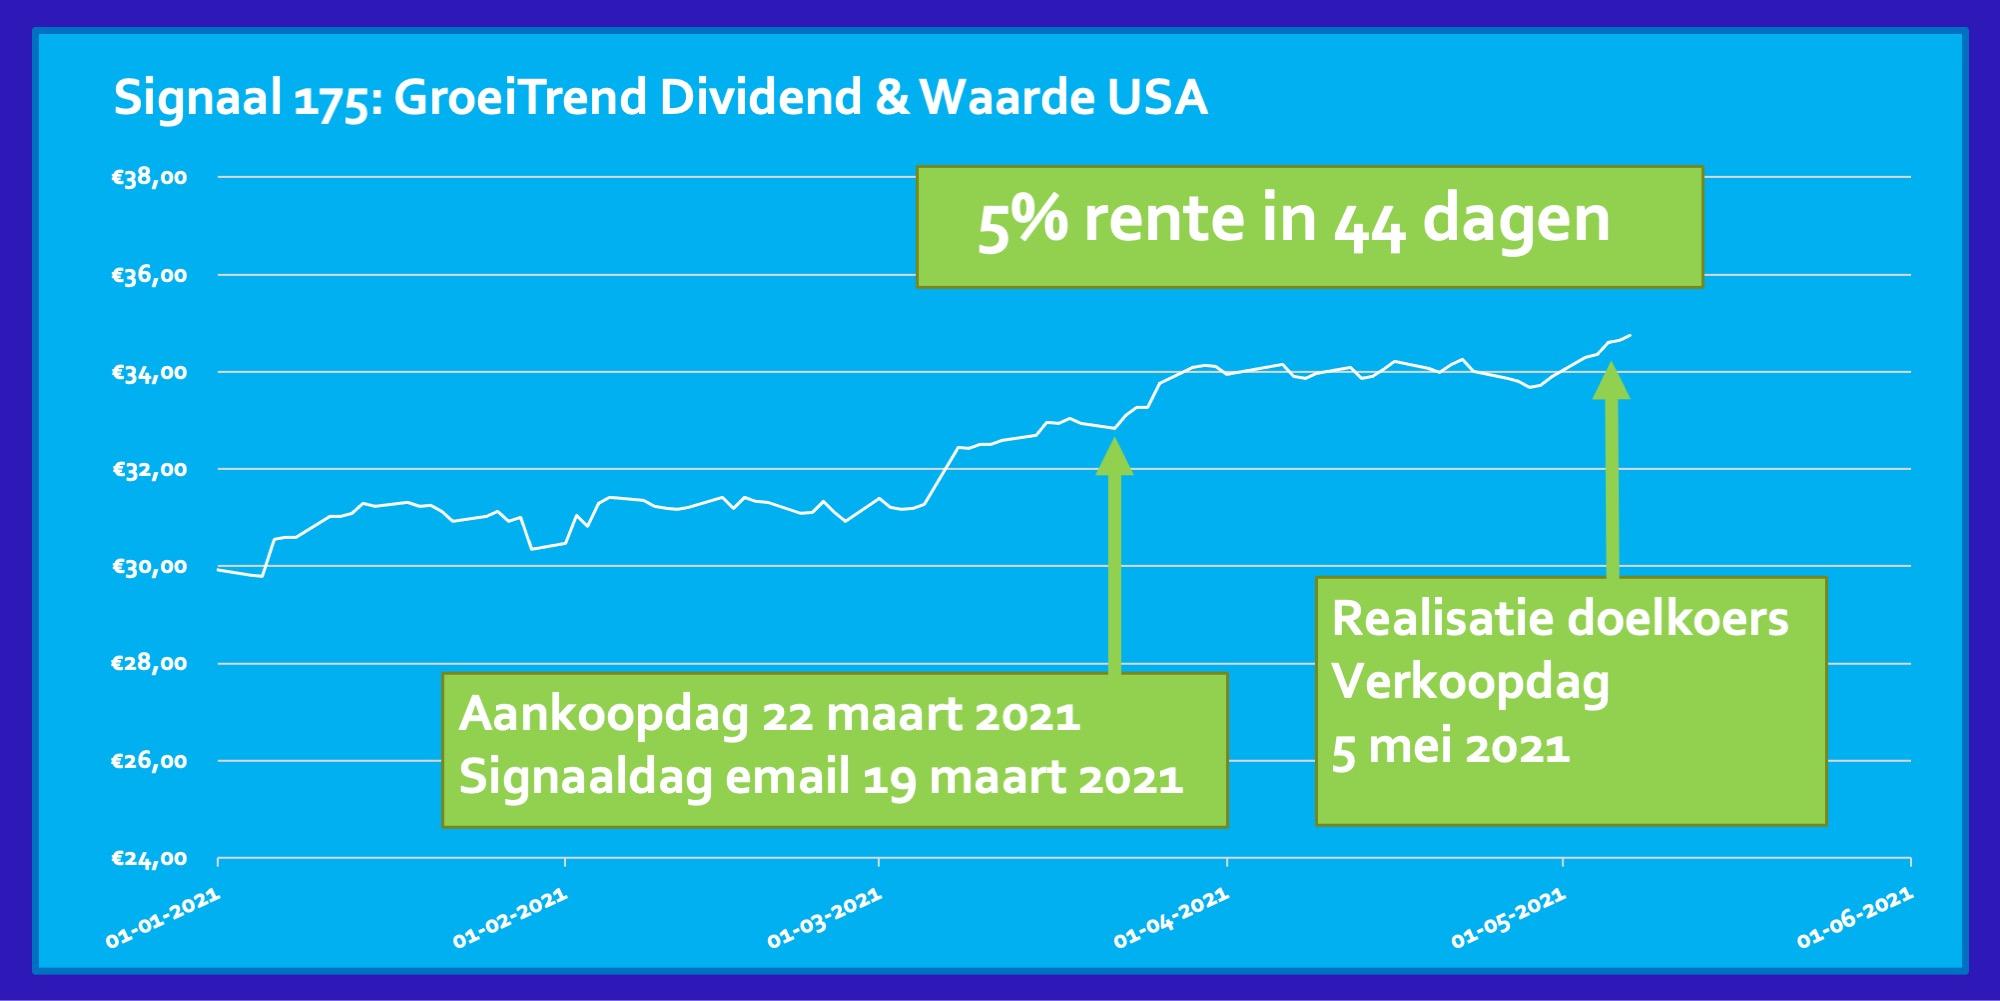 Signaal 175 ETF Dividend en Waarde USA 5 procent in 44 dagen